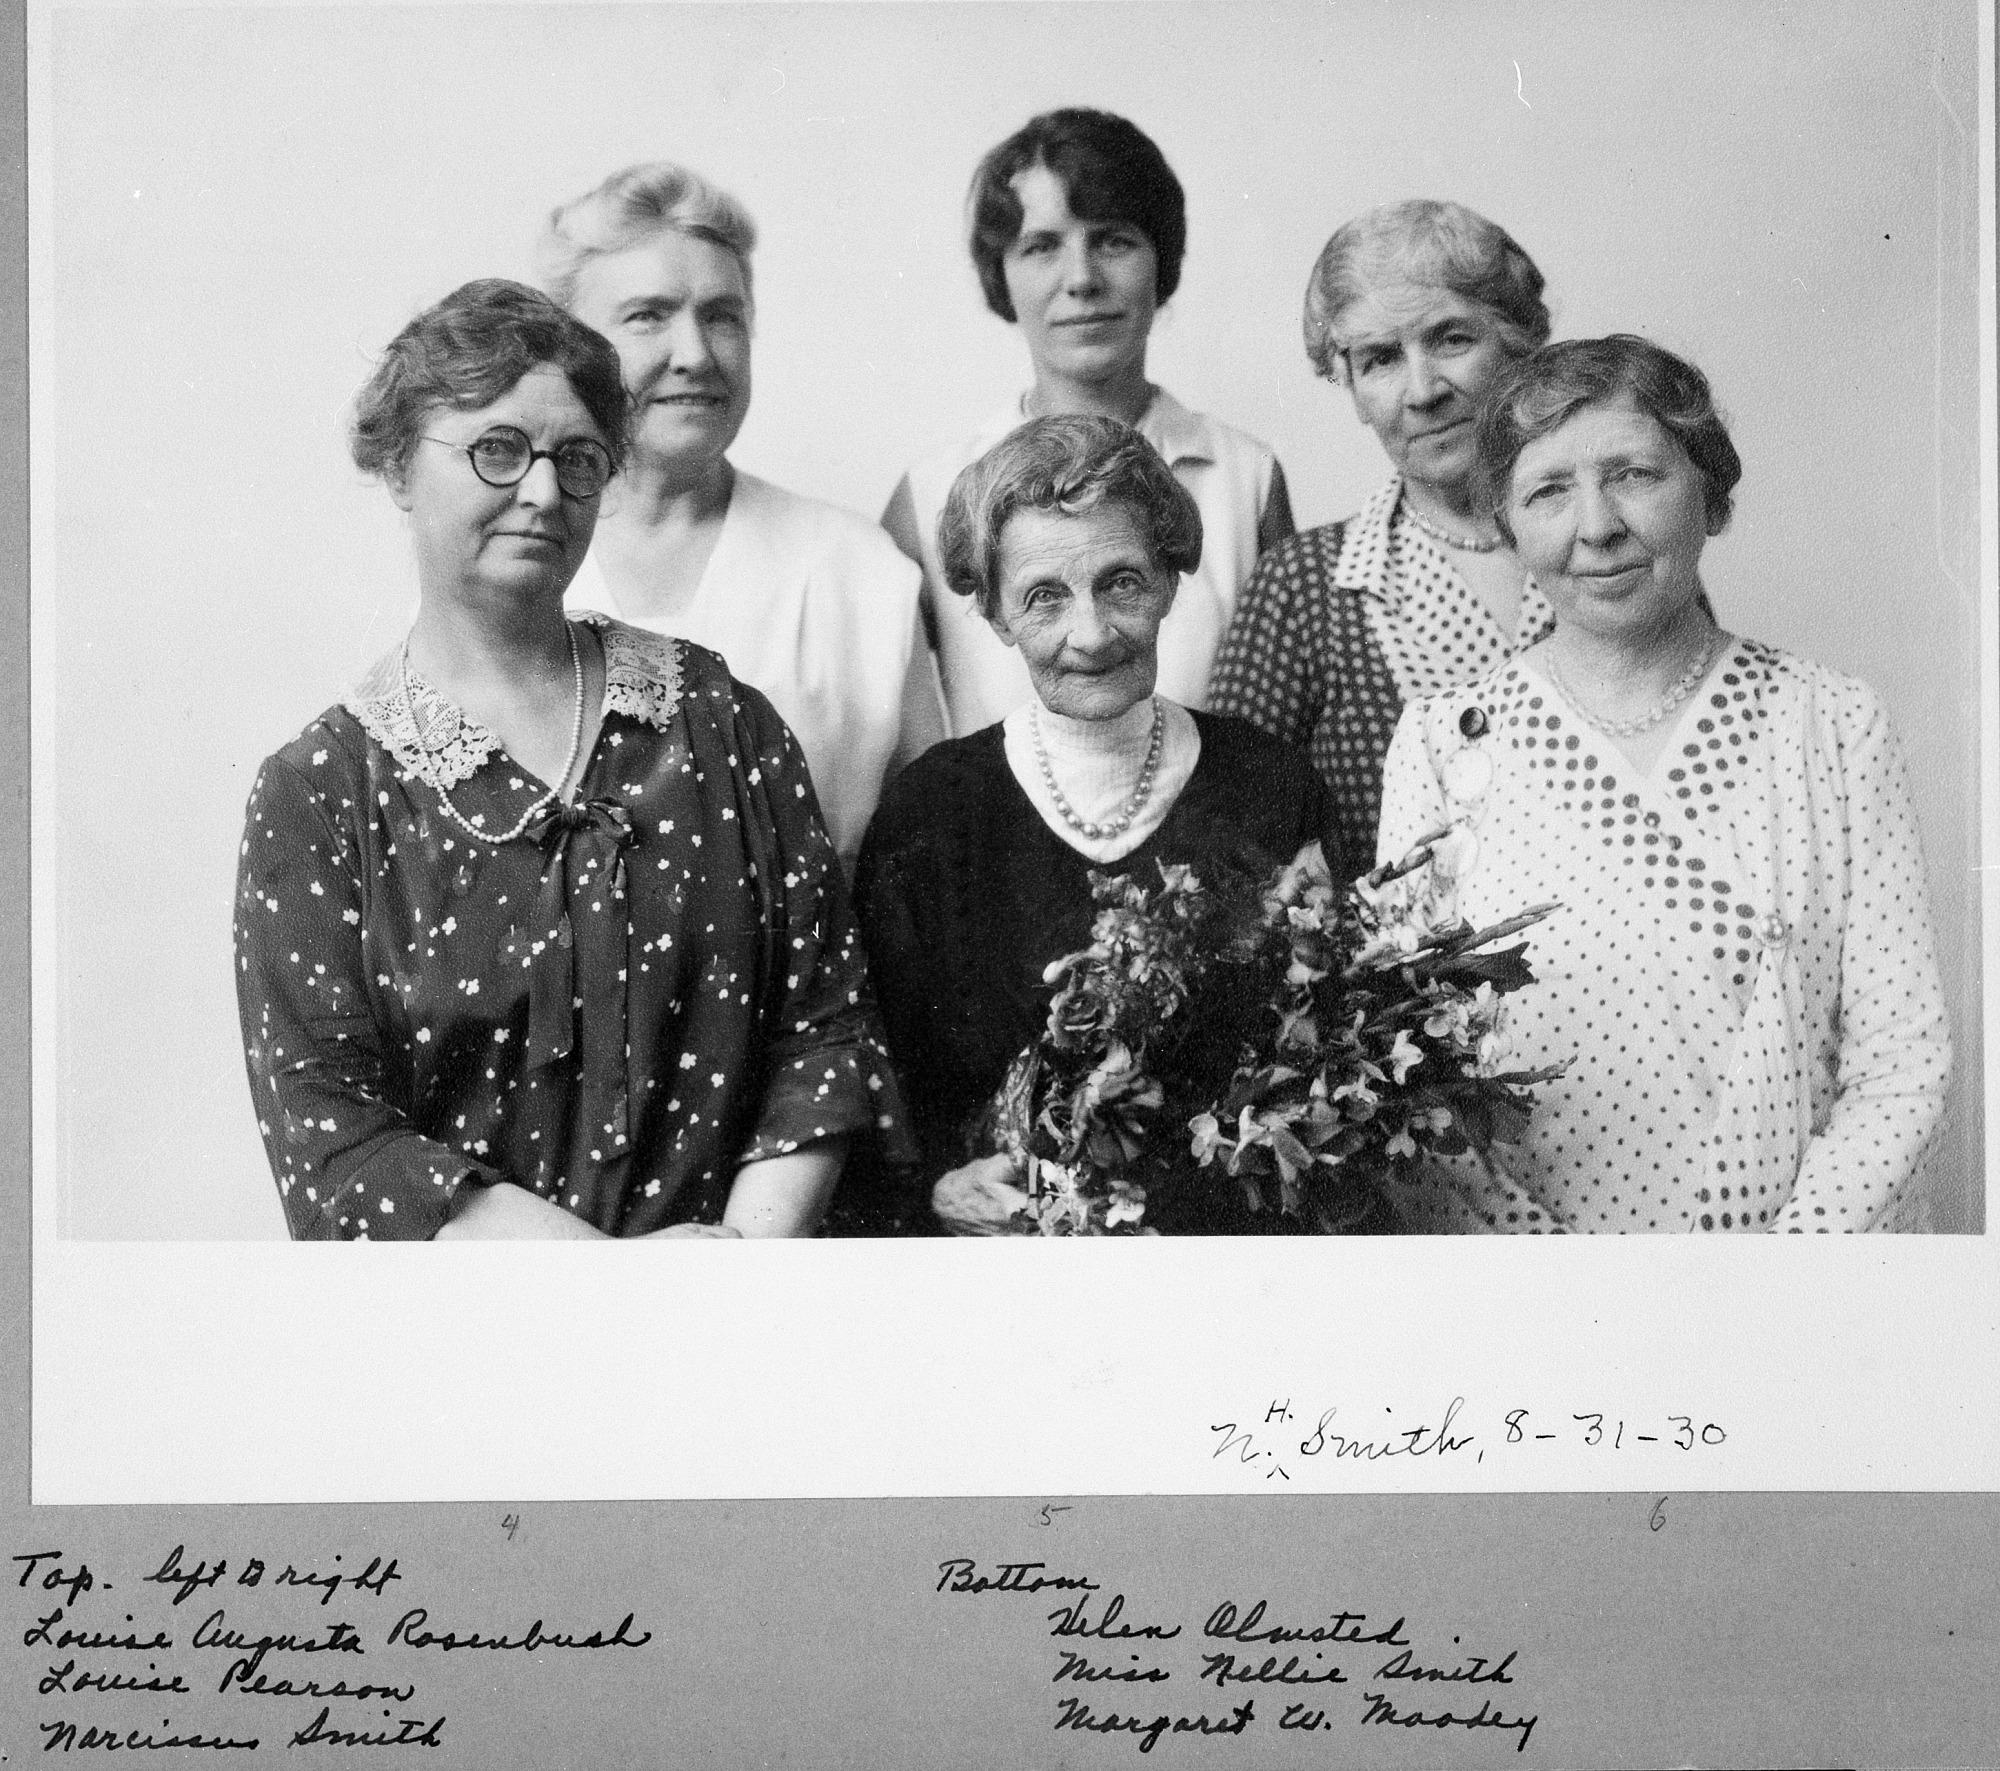 Smithsonian Secretaries and Clerks, 1930